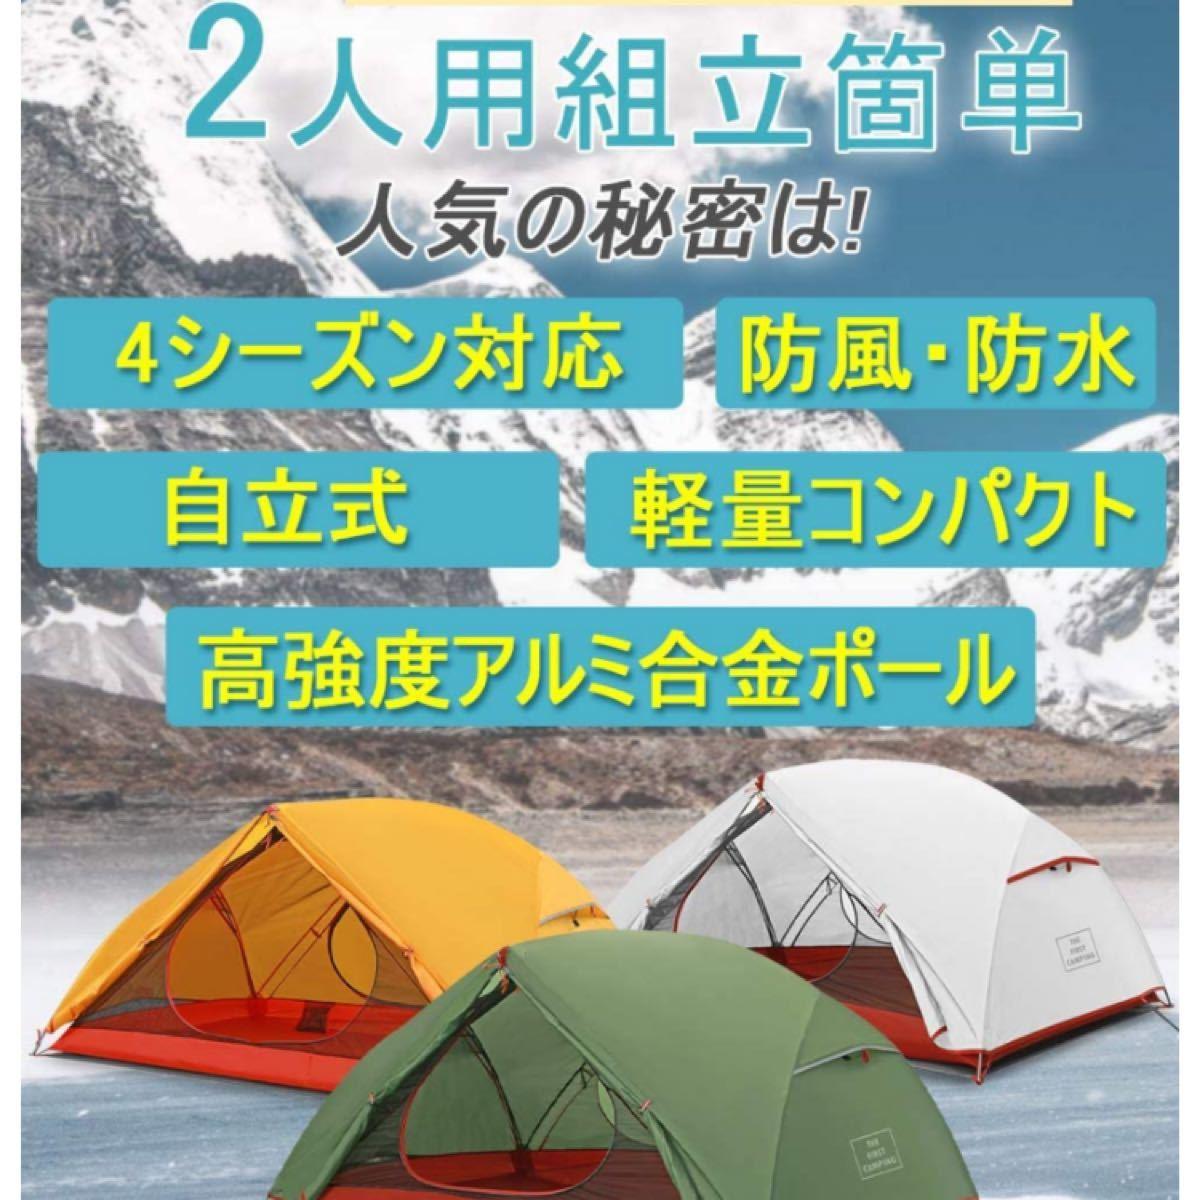 SKYLINK ドーム 2人用 テント ツーリング ソロ 1人用 テント ツーリングドーム 人気商品